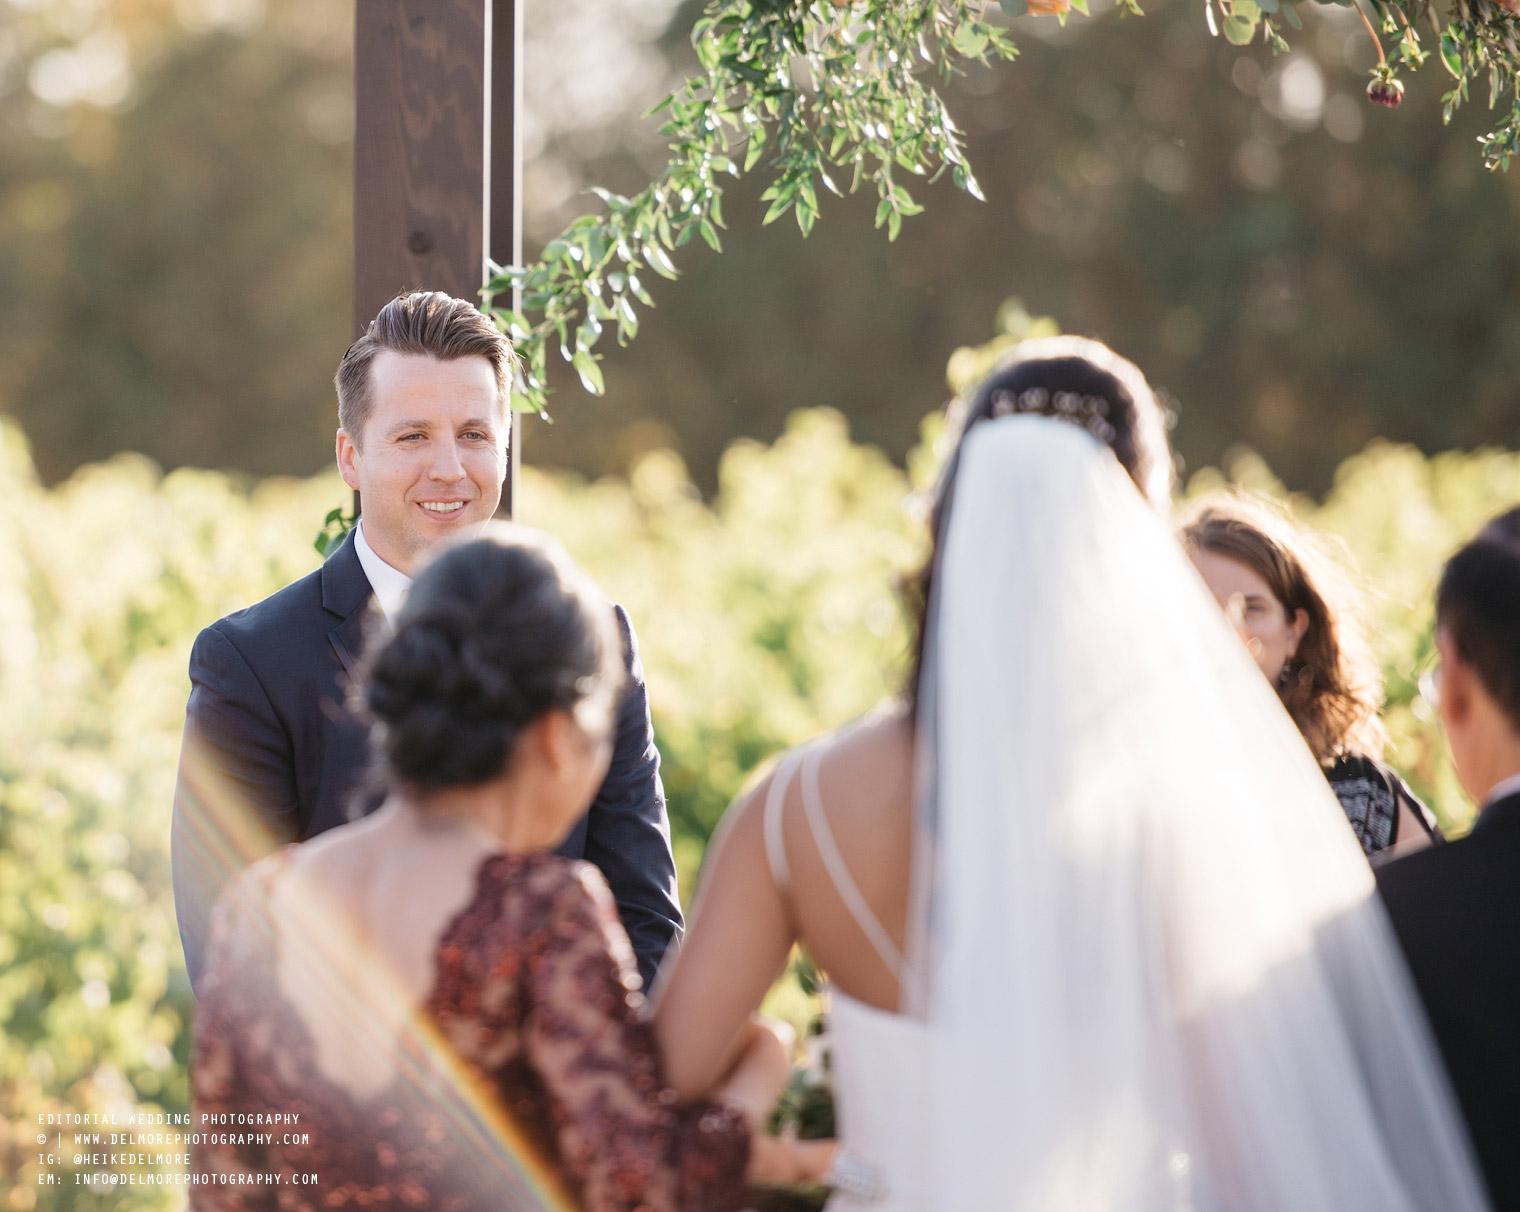 top-windsor-winery-wedding-photographer-035.jpg